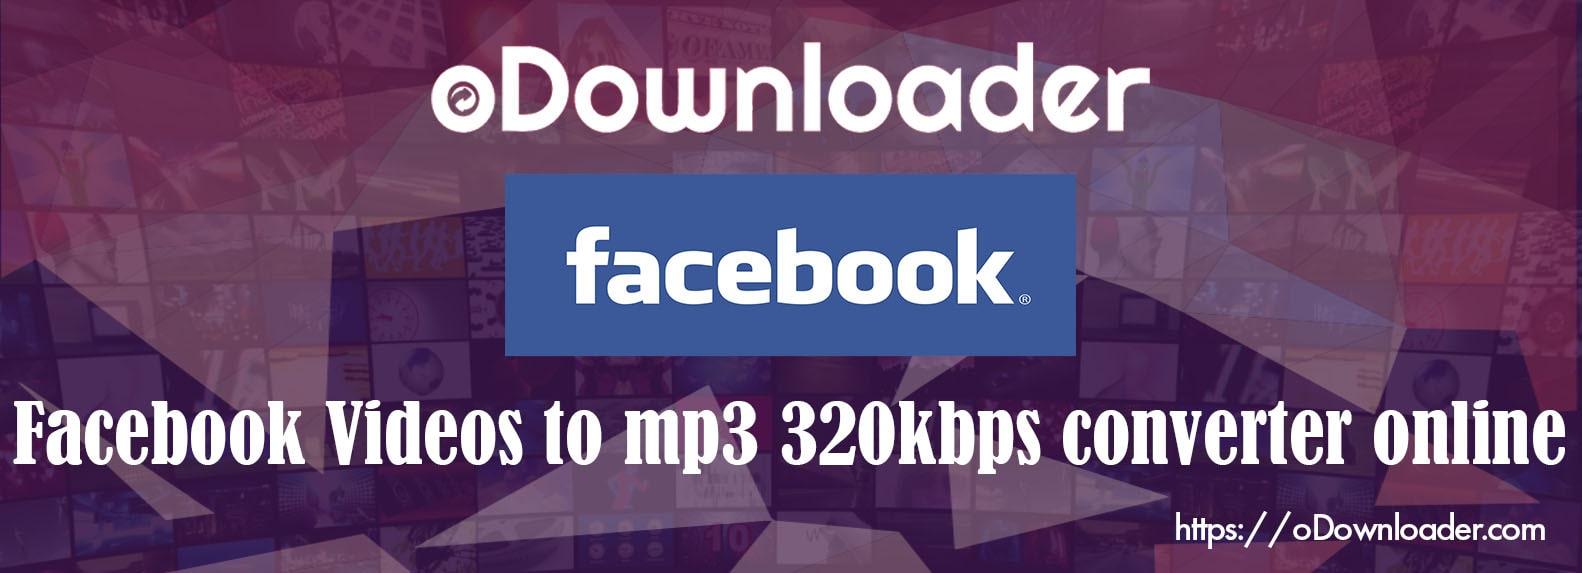 Facebook Video to Mp3 320Kbps Online 2019 - Fb to Mp3 320Kbps